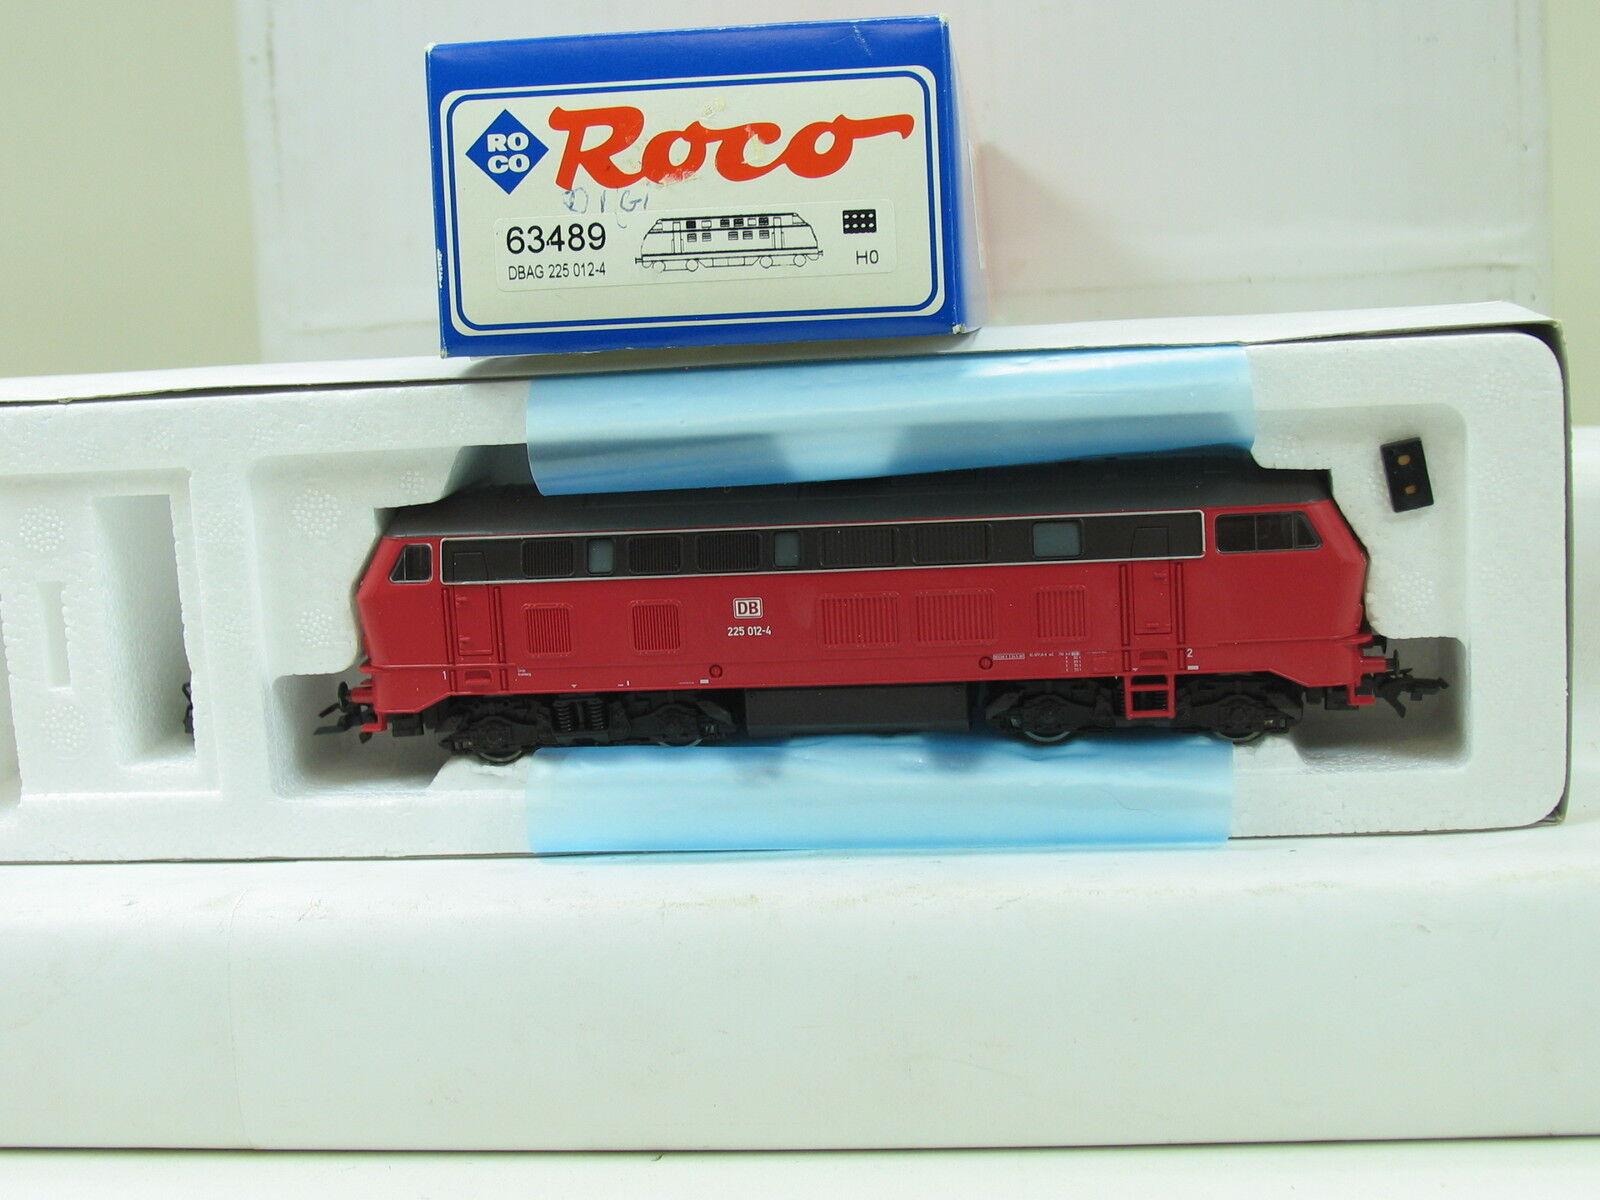 Roco h0 63489 Digital Diesellok 225 012-4 the DB b351